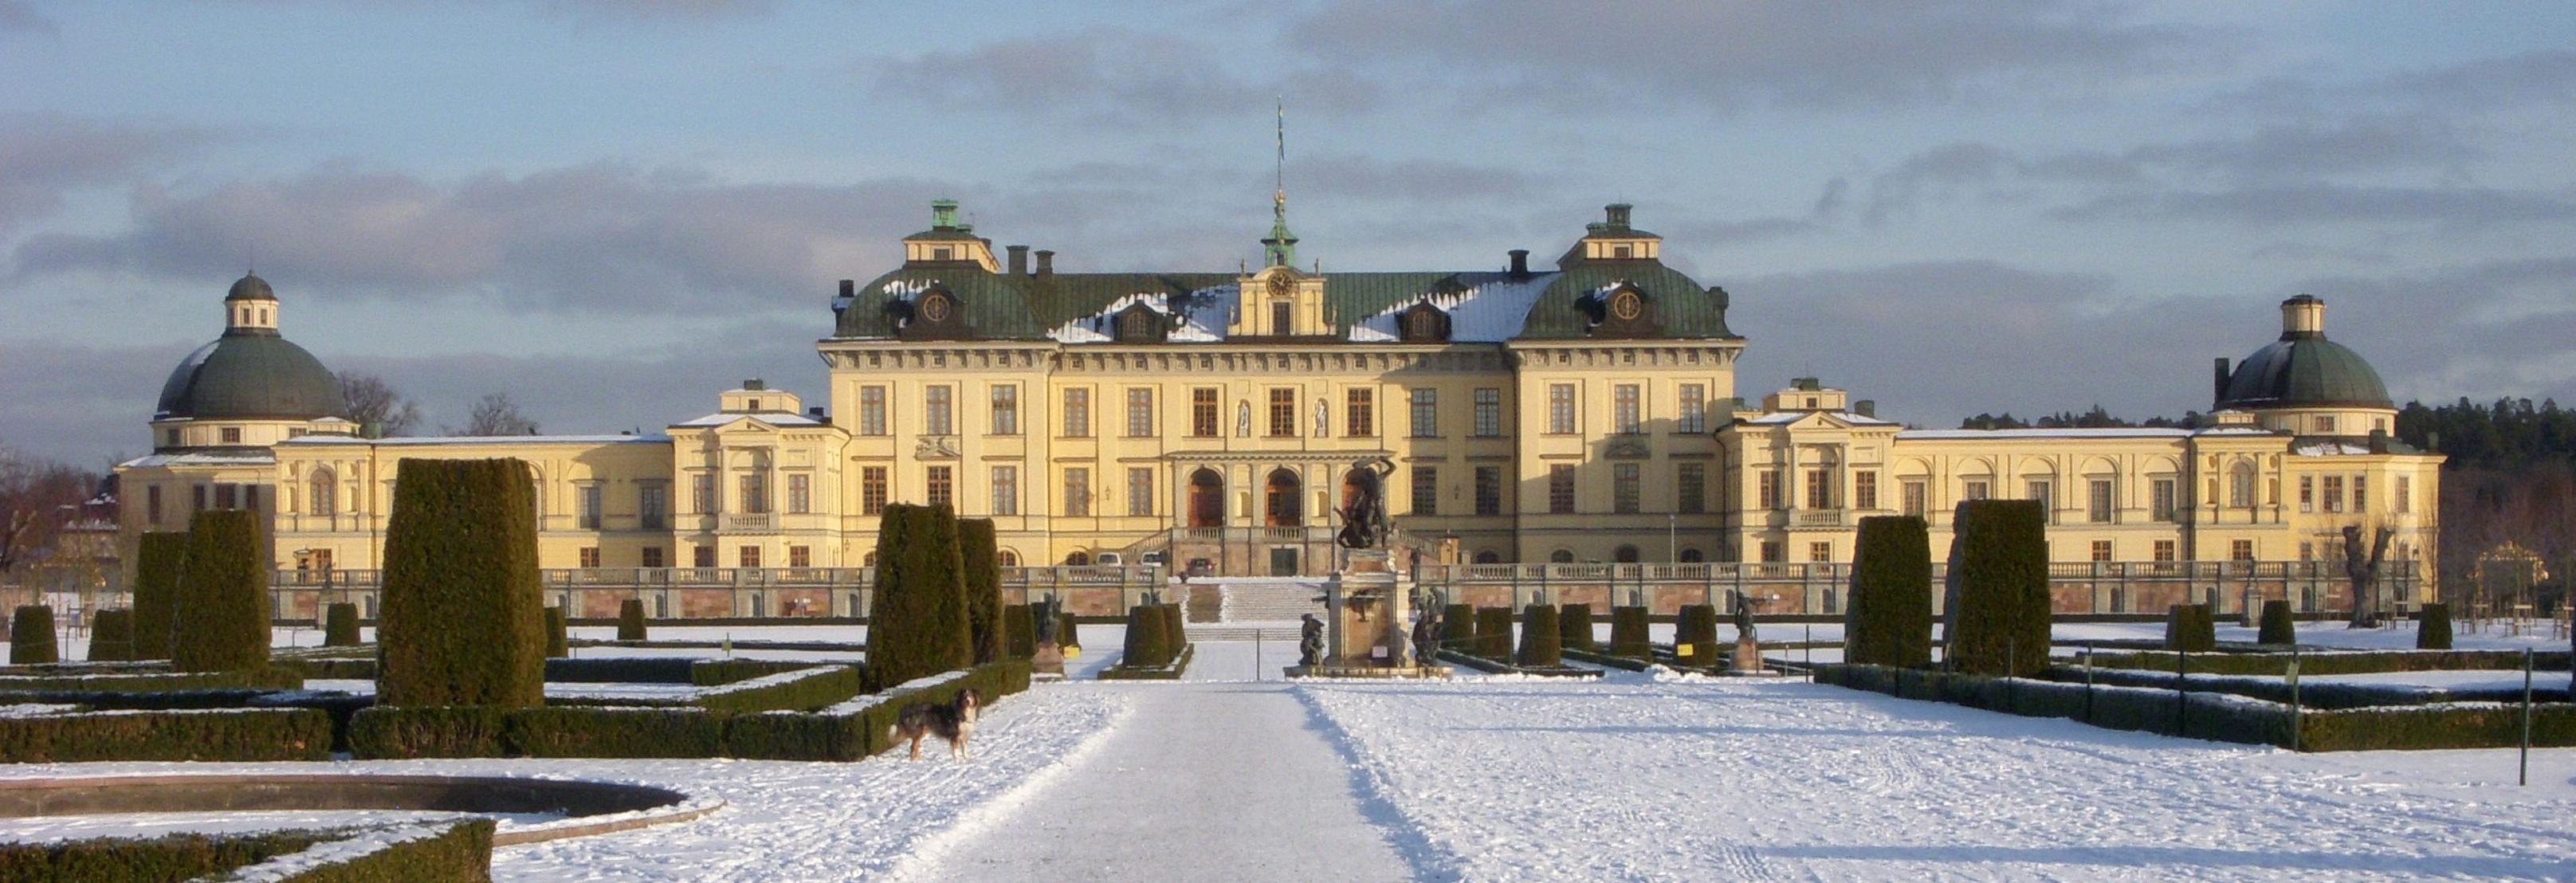 slott i stockholm